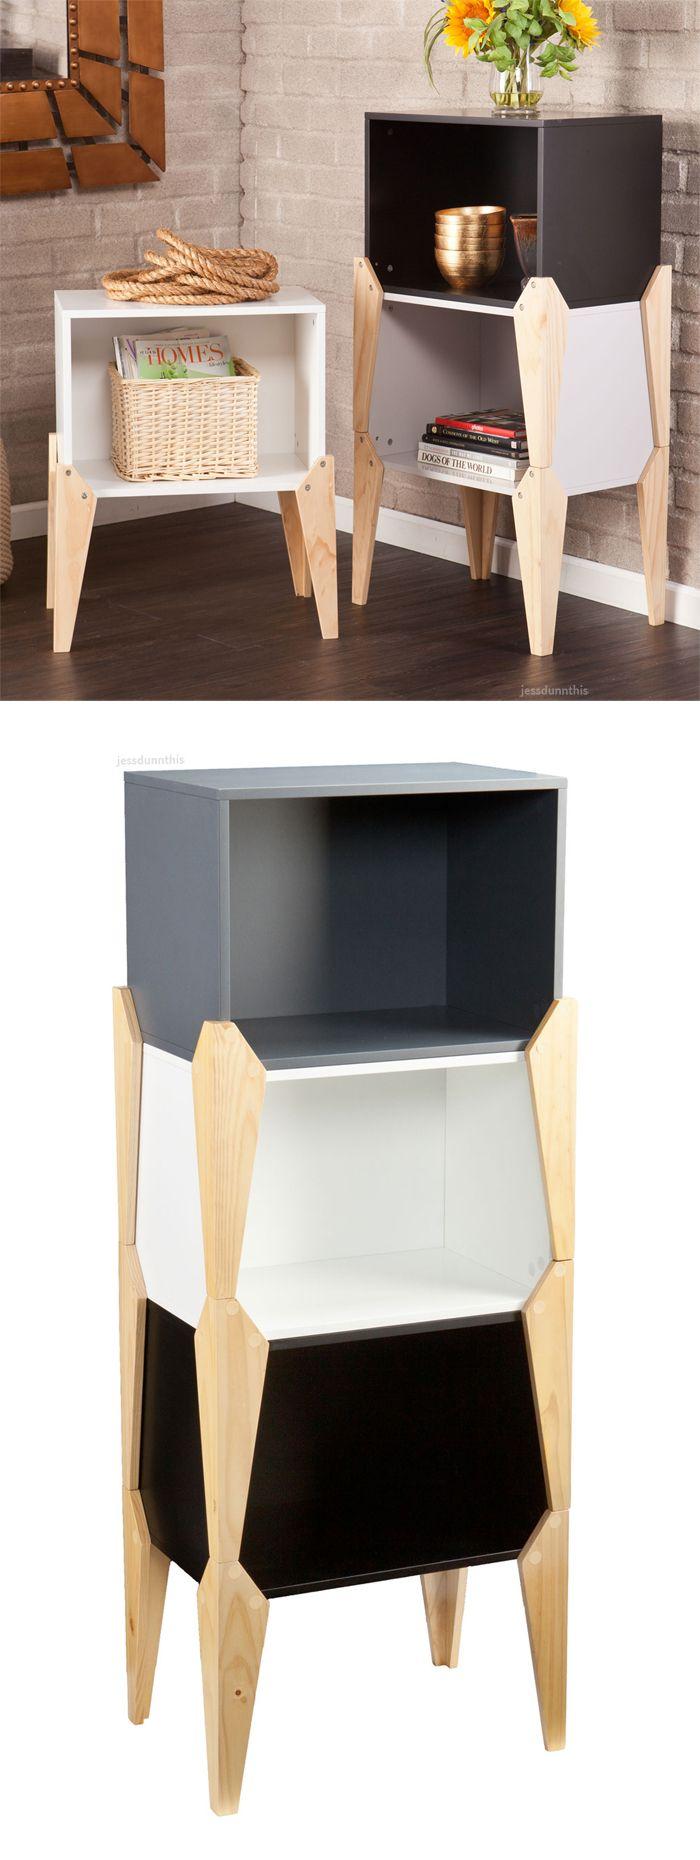 3 Pc Stacking Tables Furniture Interior Furniture Furniture